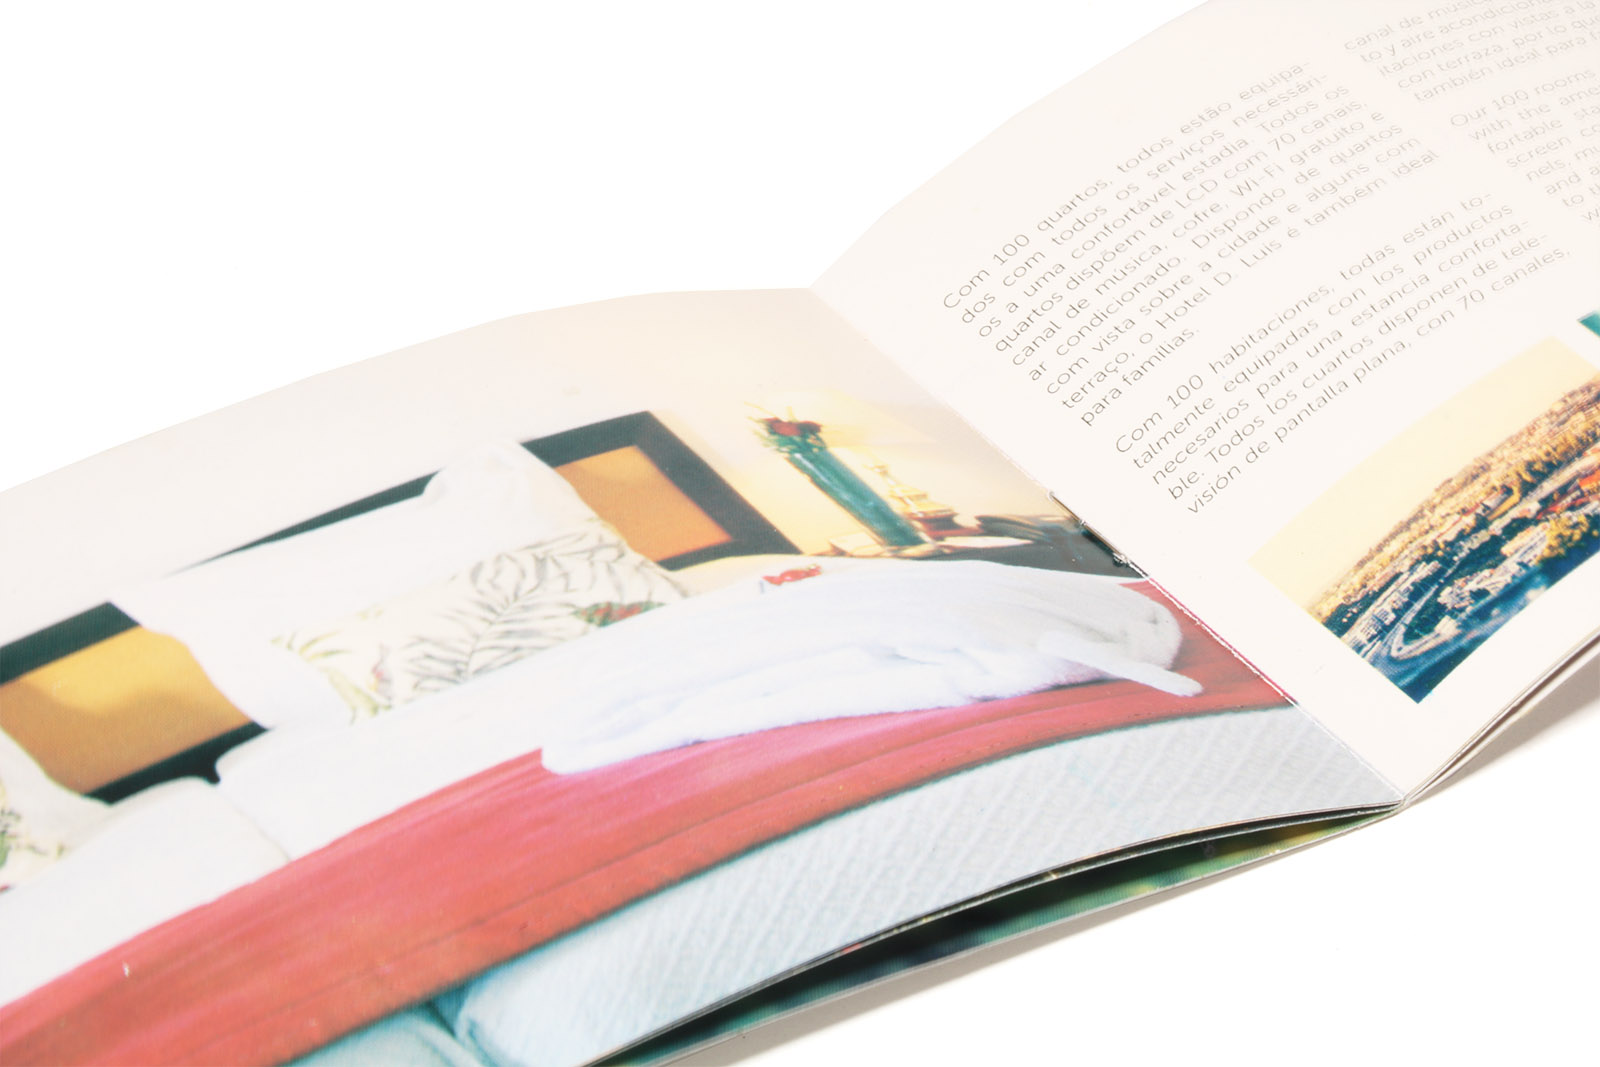 revista pequena aberta